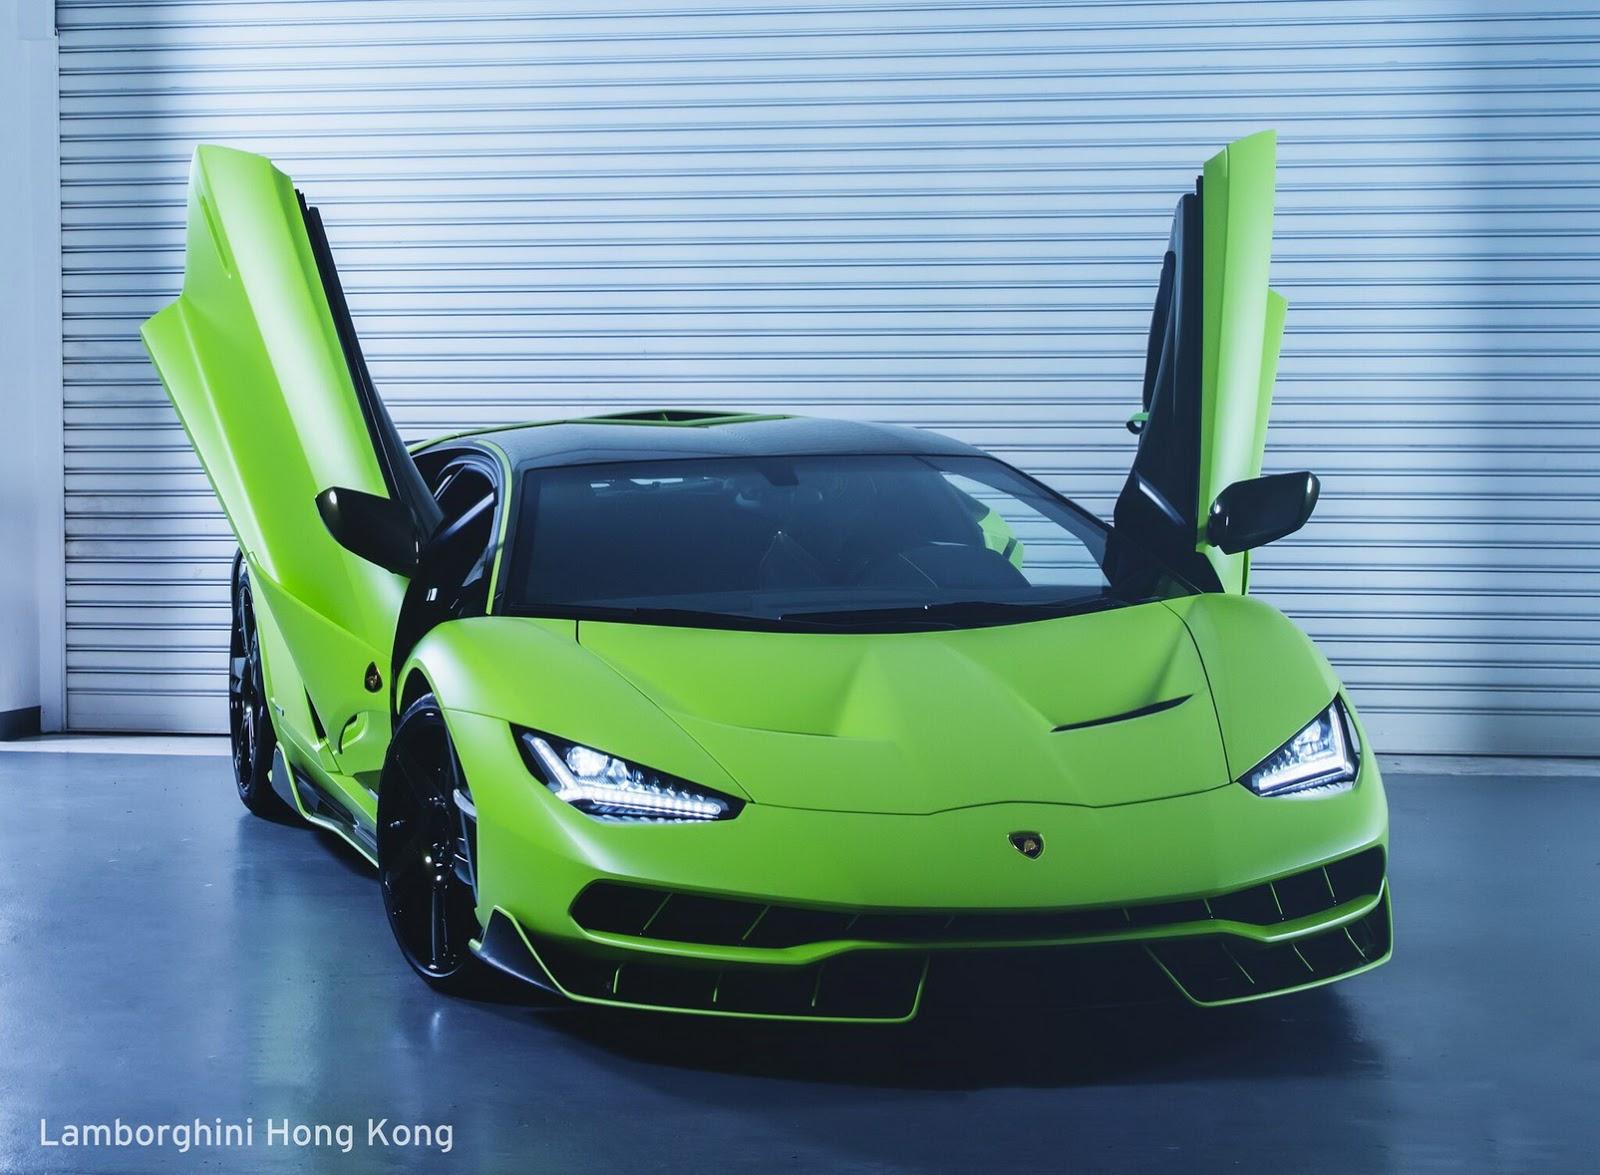 Verde Bronte Lamborghini Centenario Debuts In Hong Kong Autoevolution